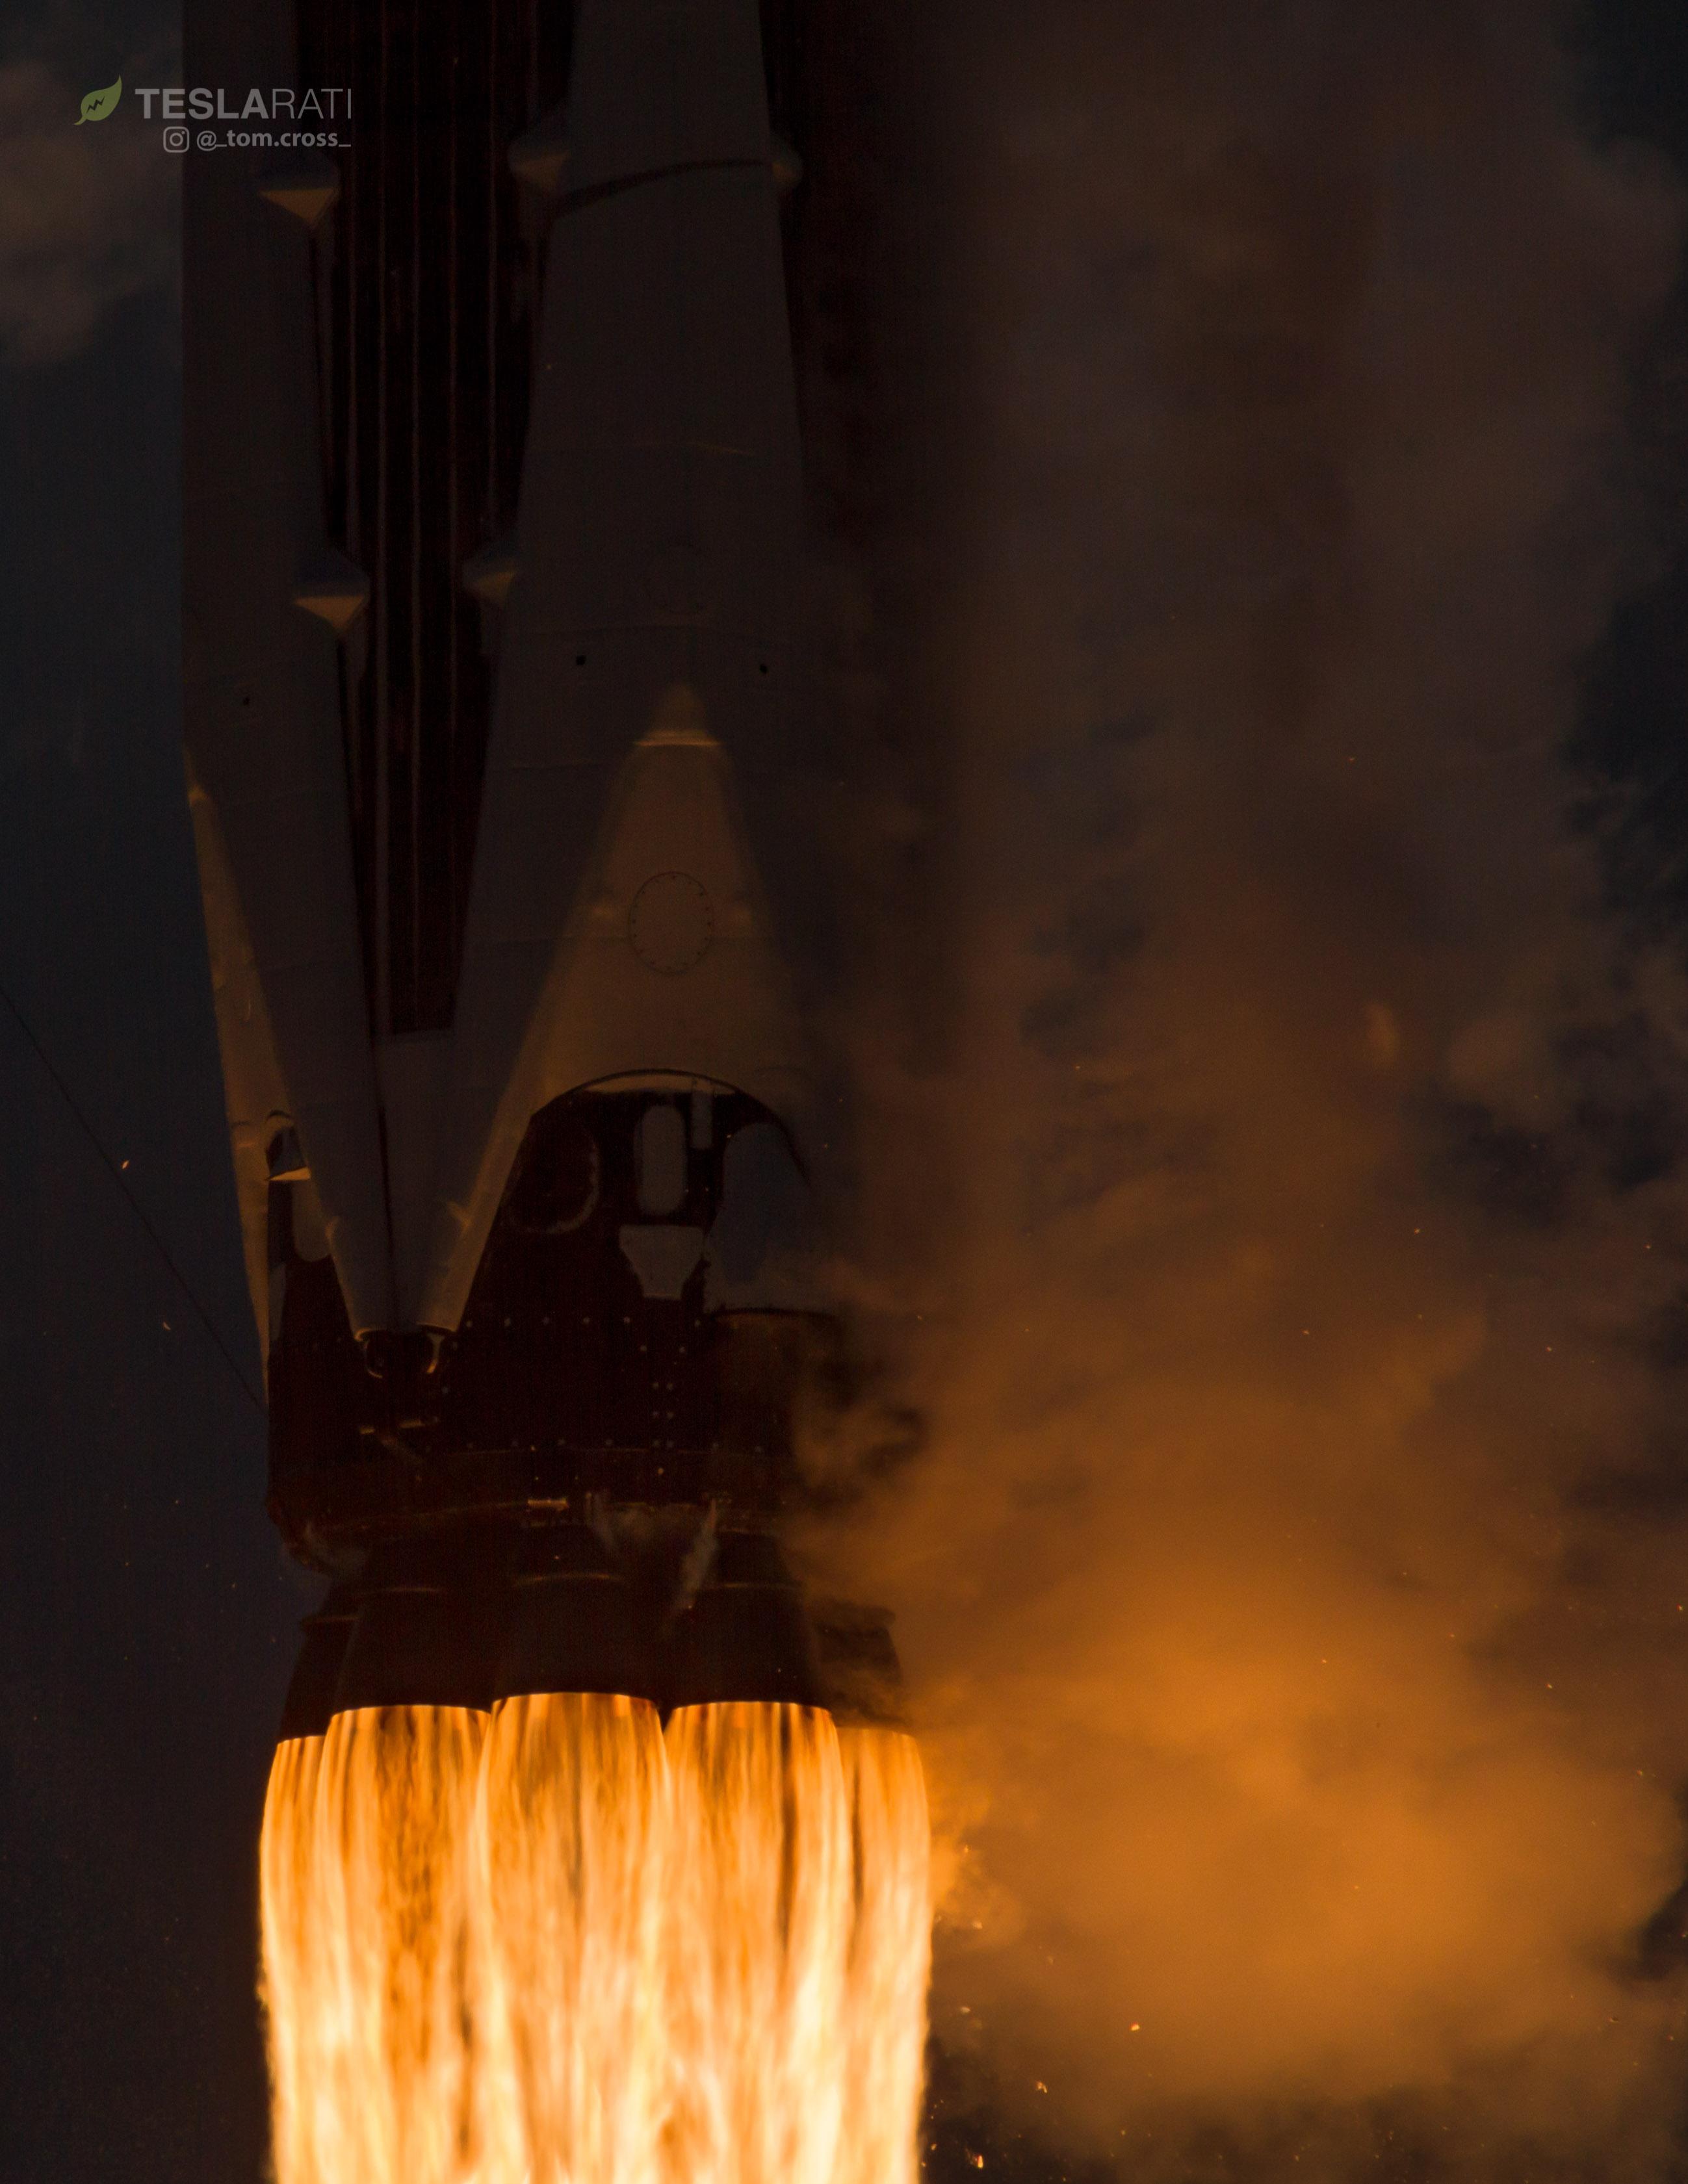 1039 CRS14 launch closeup 3 (Tom Cross)